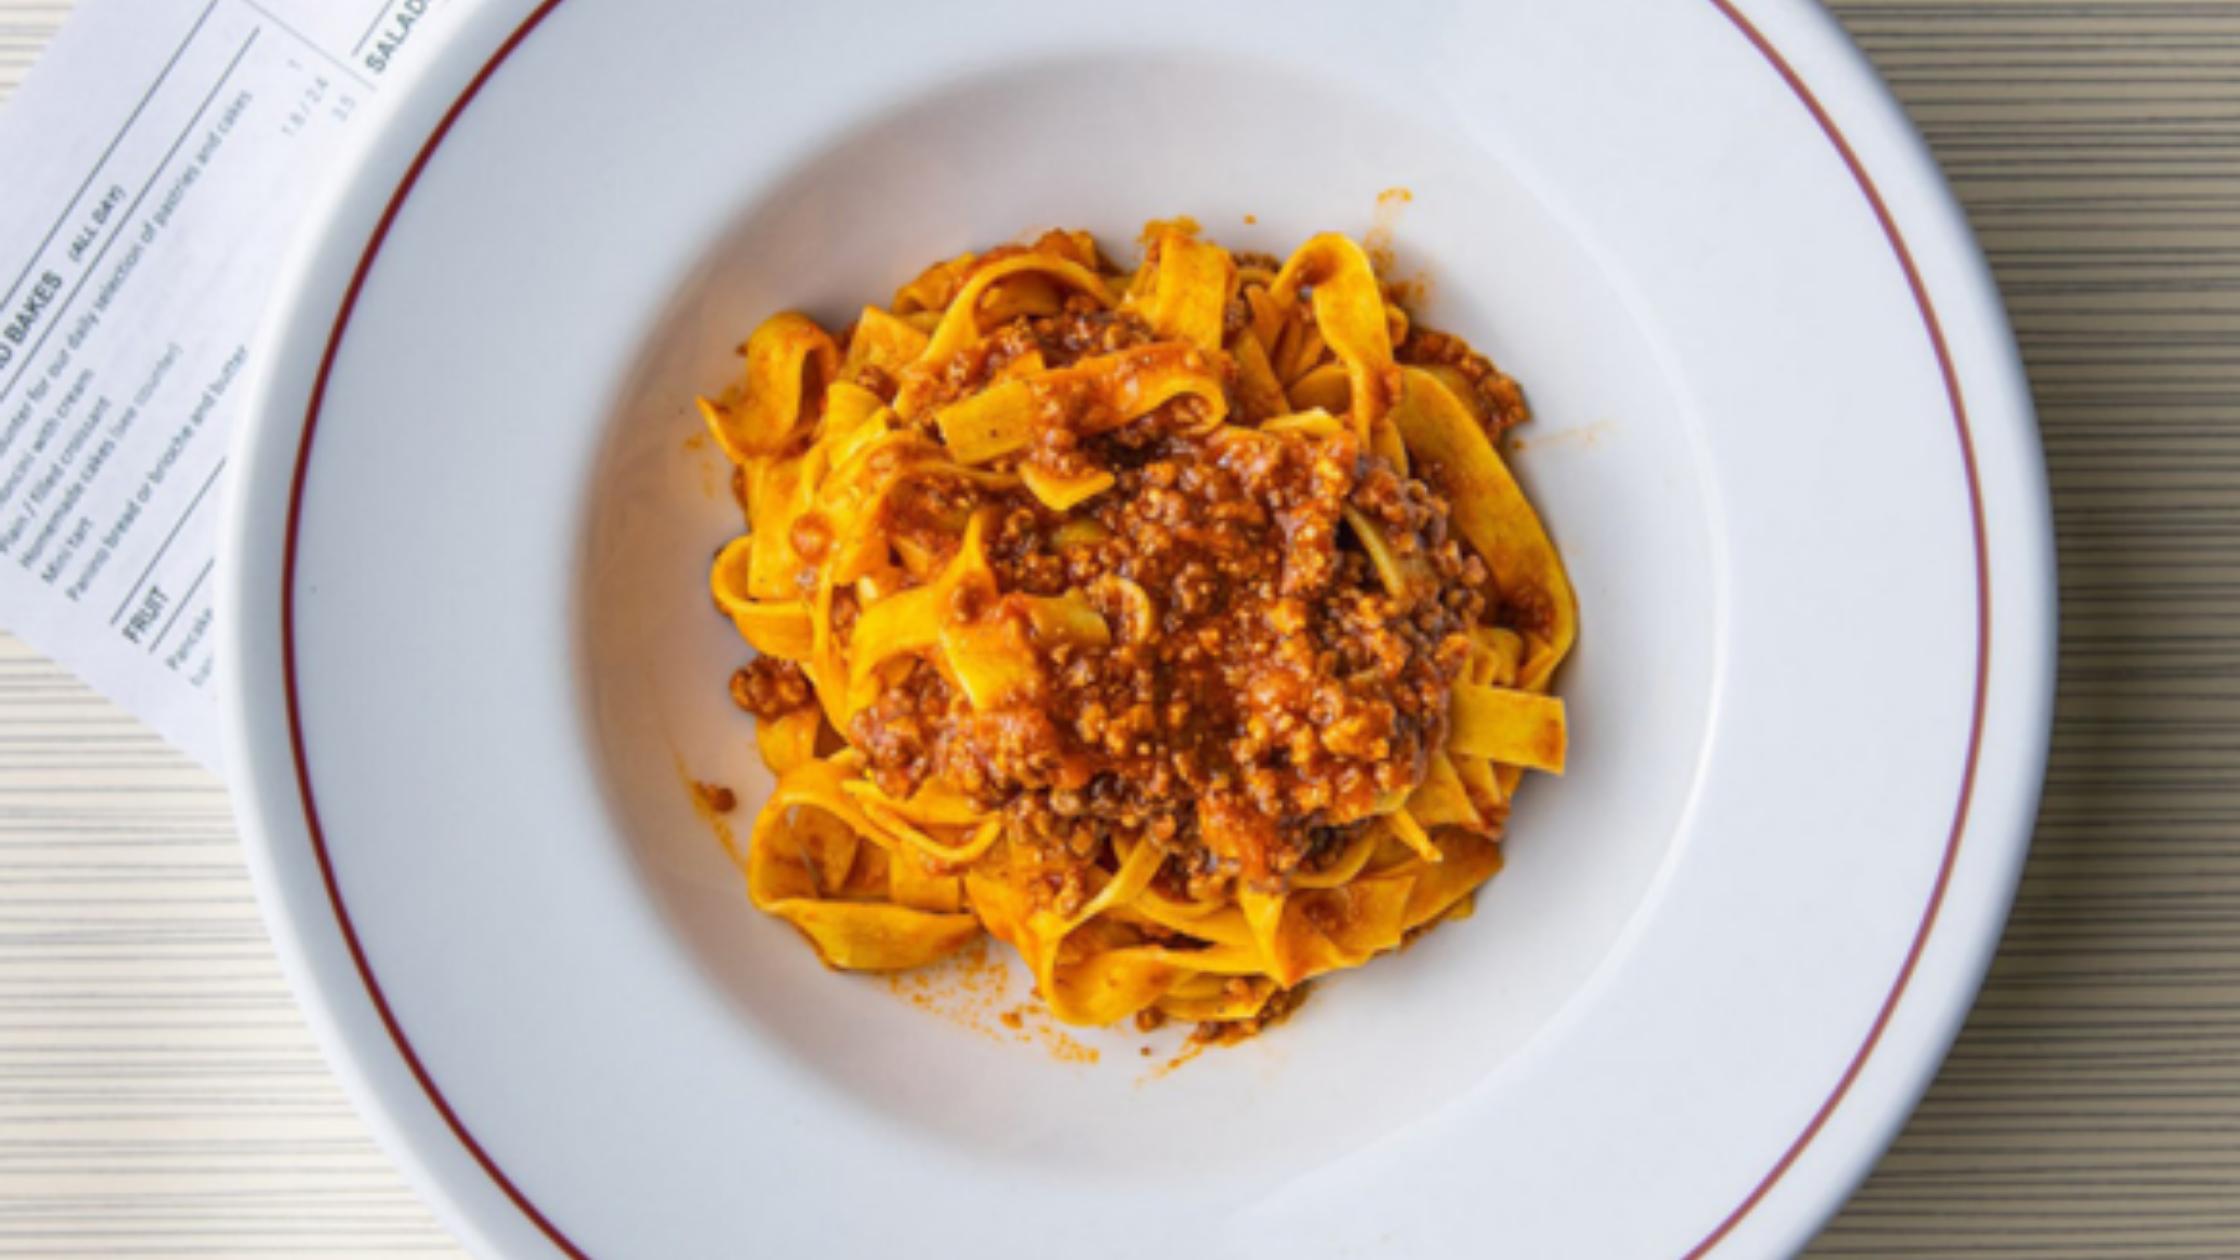 Heathy pasta meal from Latteria